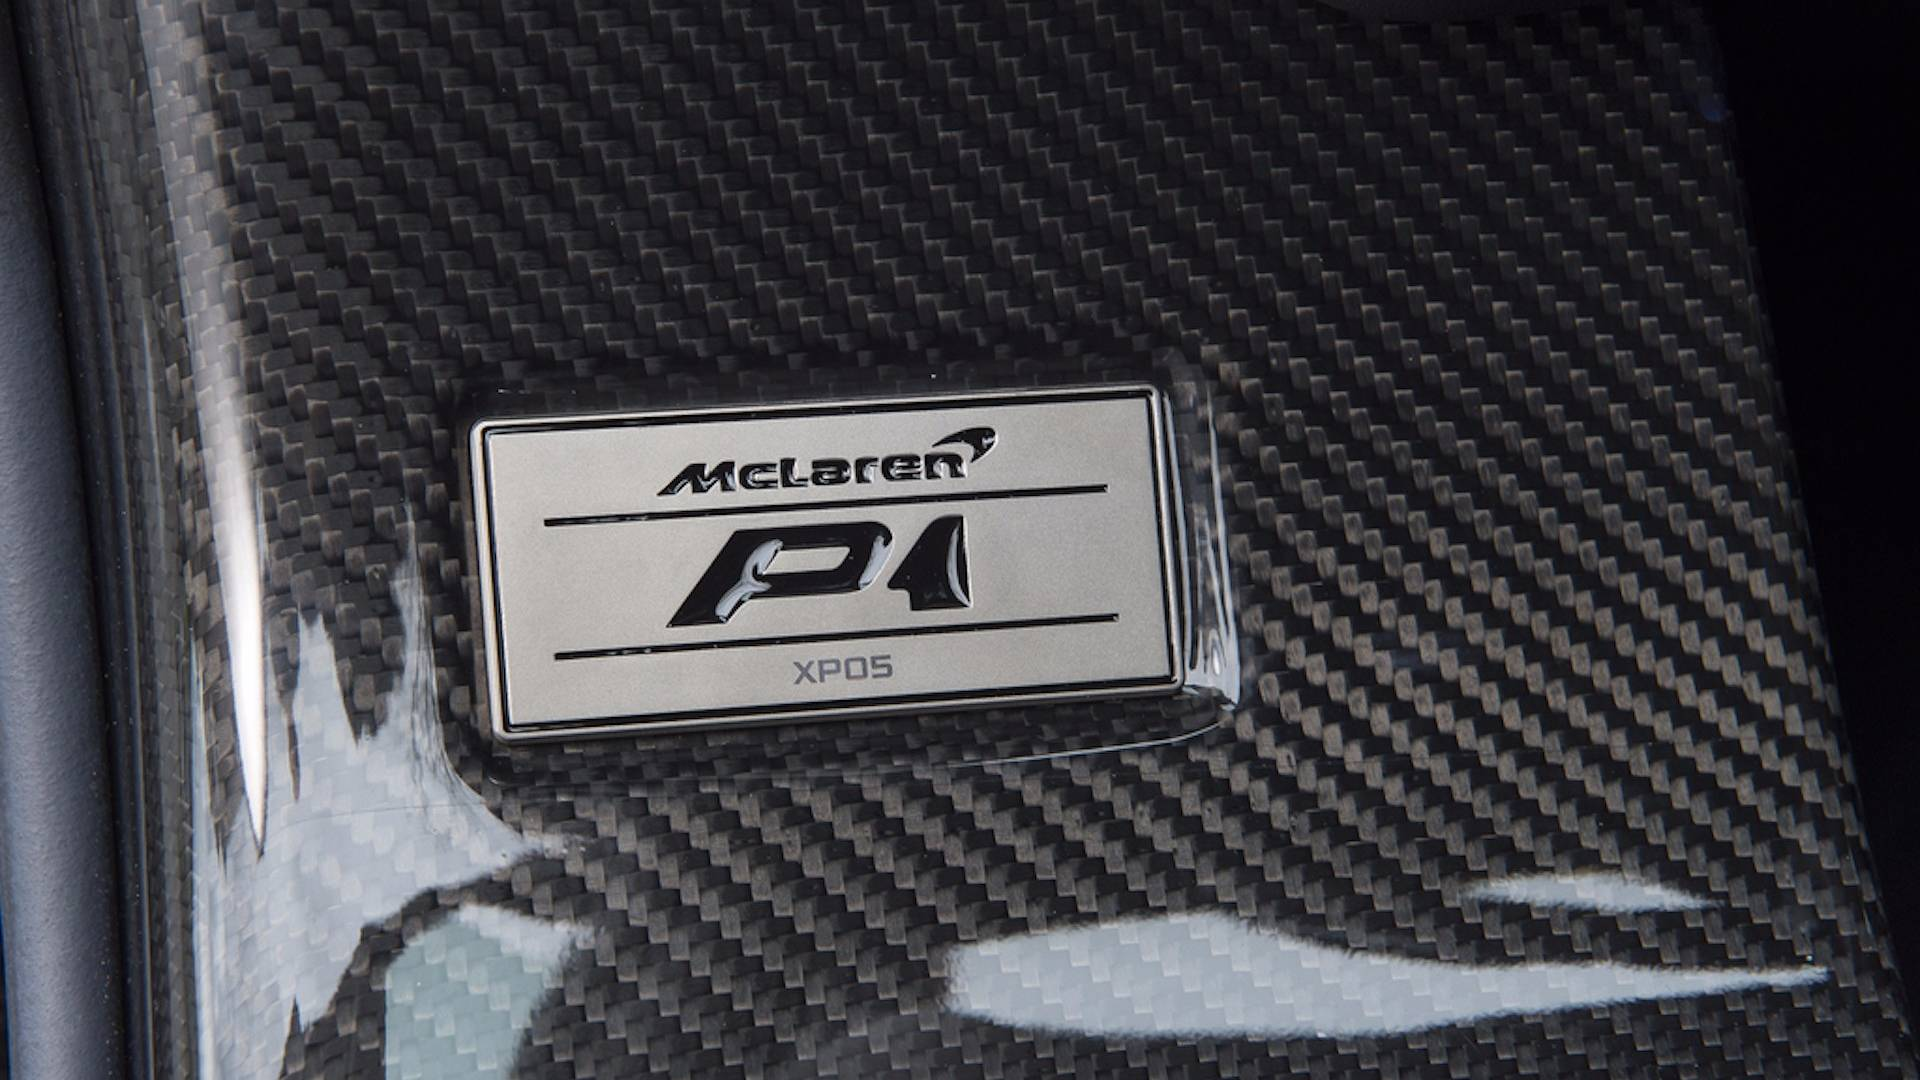 McLaren_P1_Experimental_Prototype_25